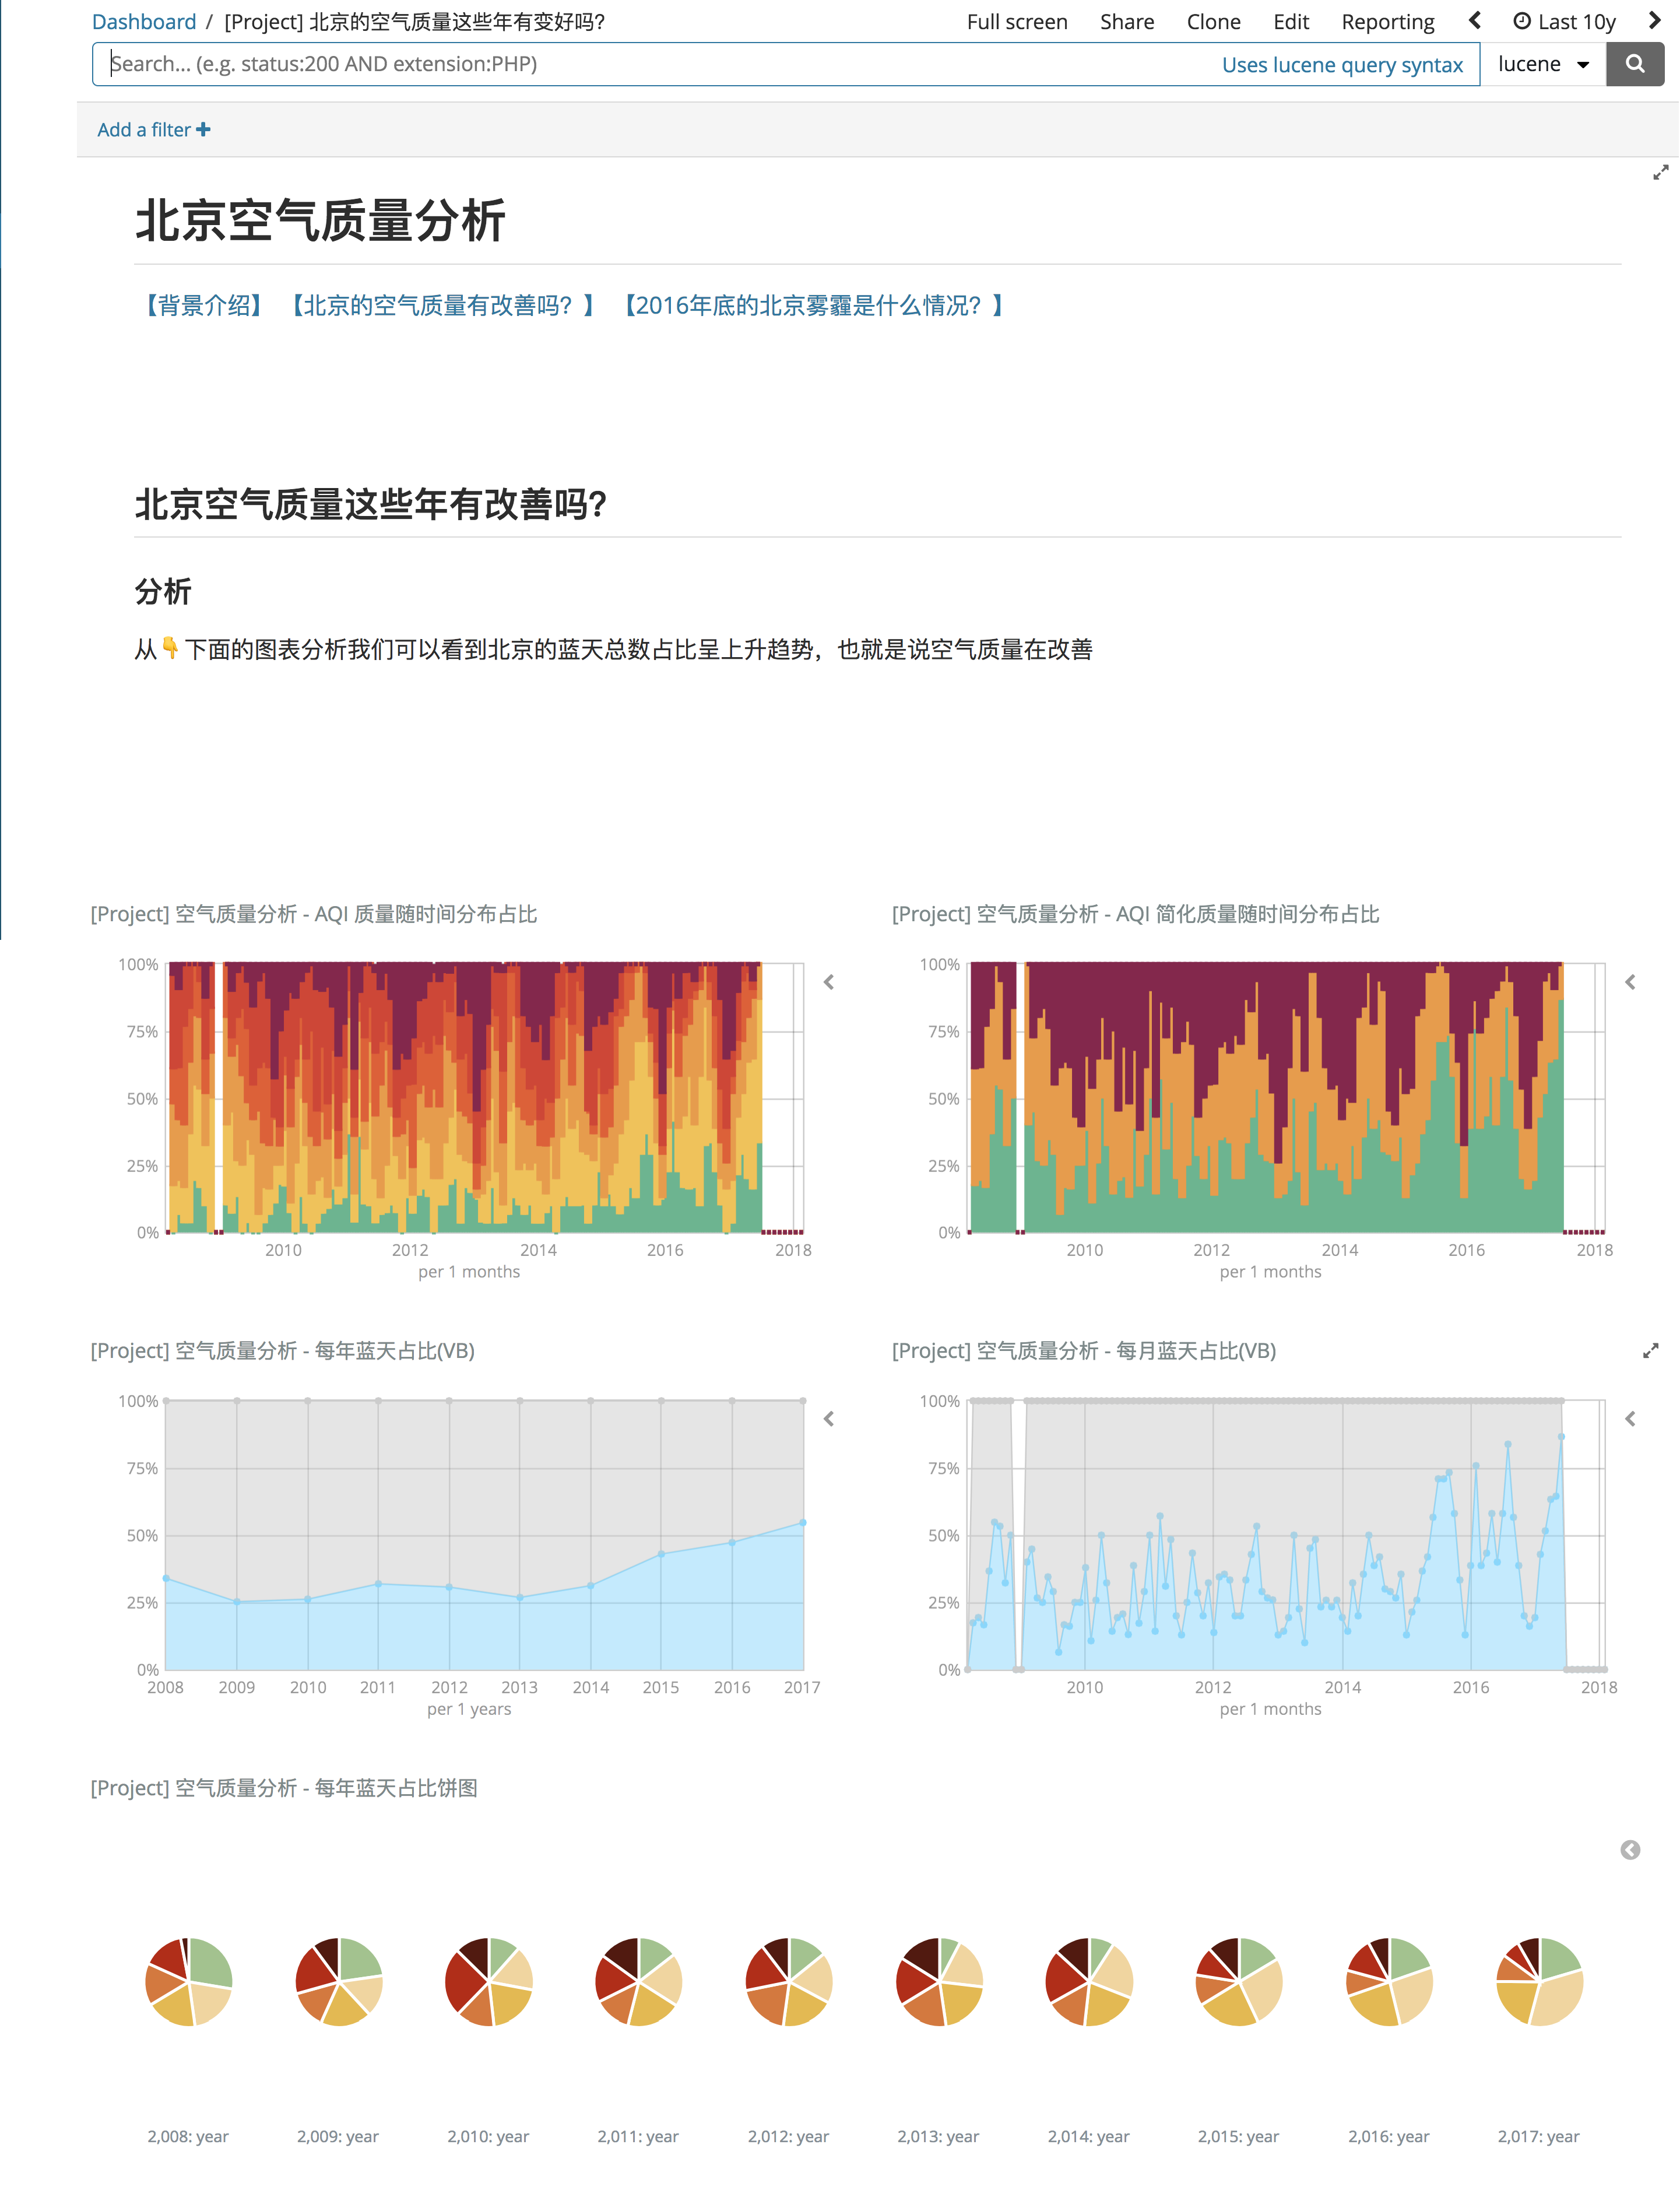 [Project]_北京的空气质量这些年有变好吗?.png